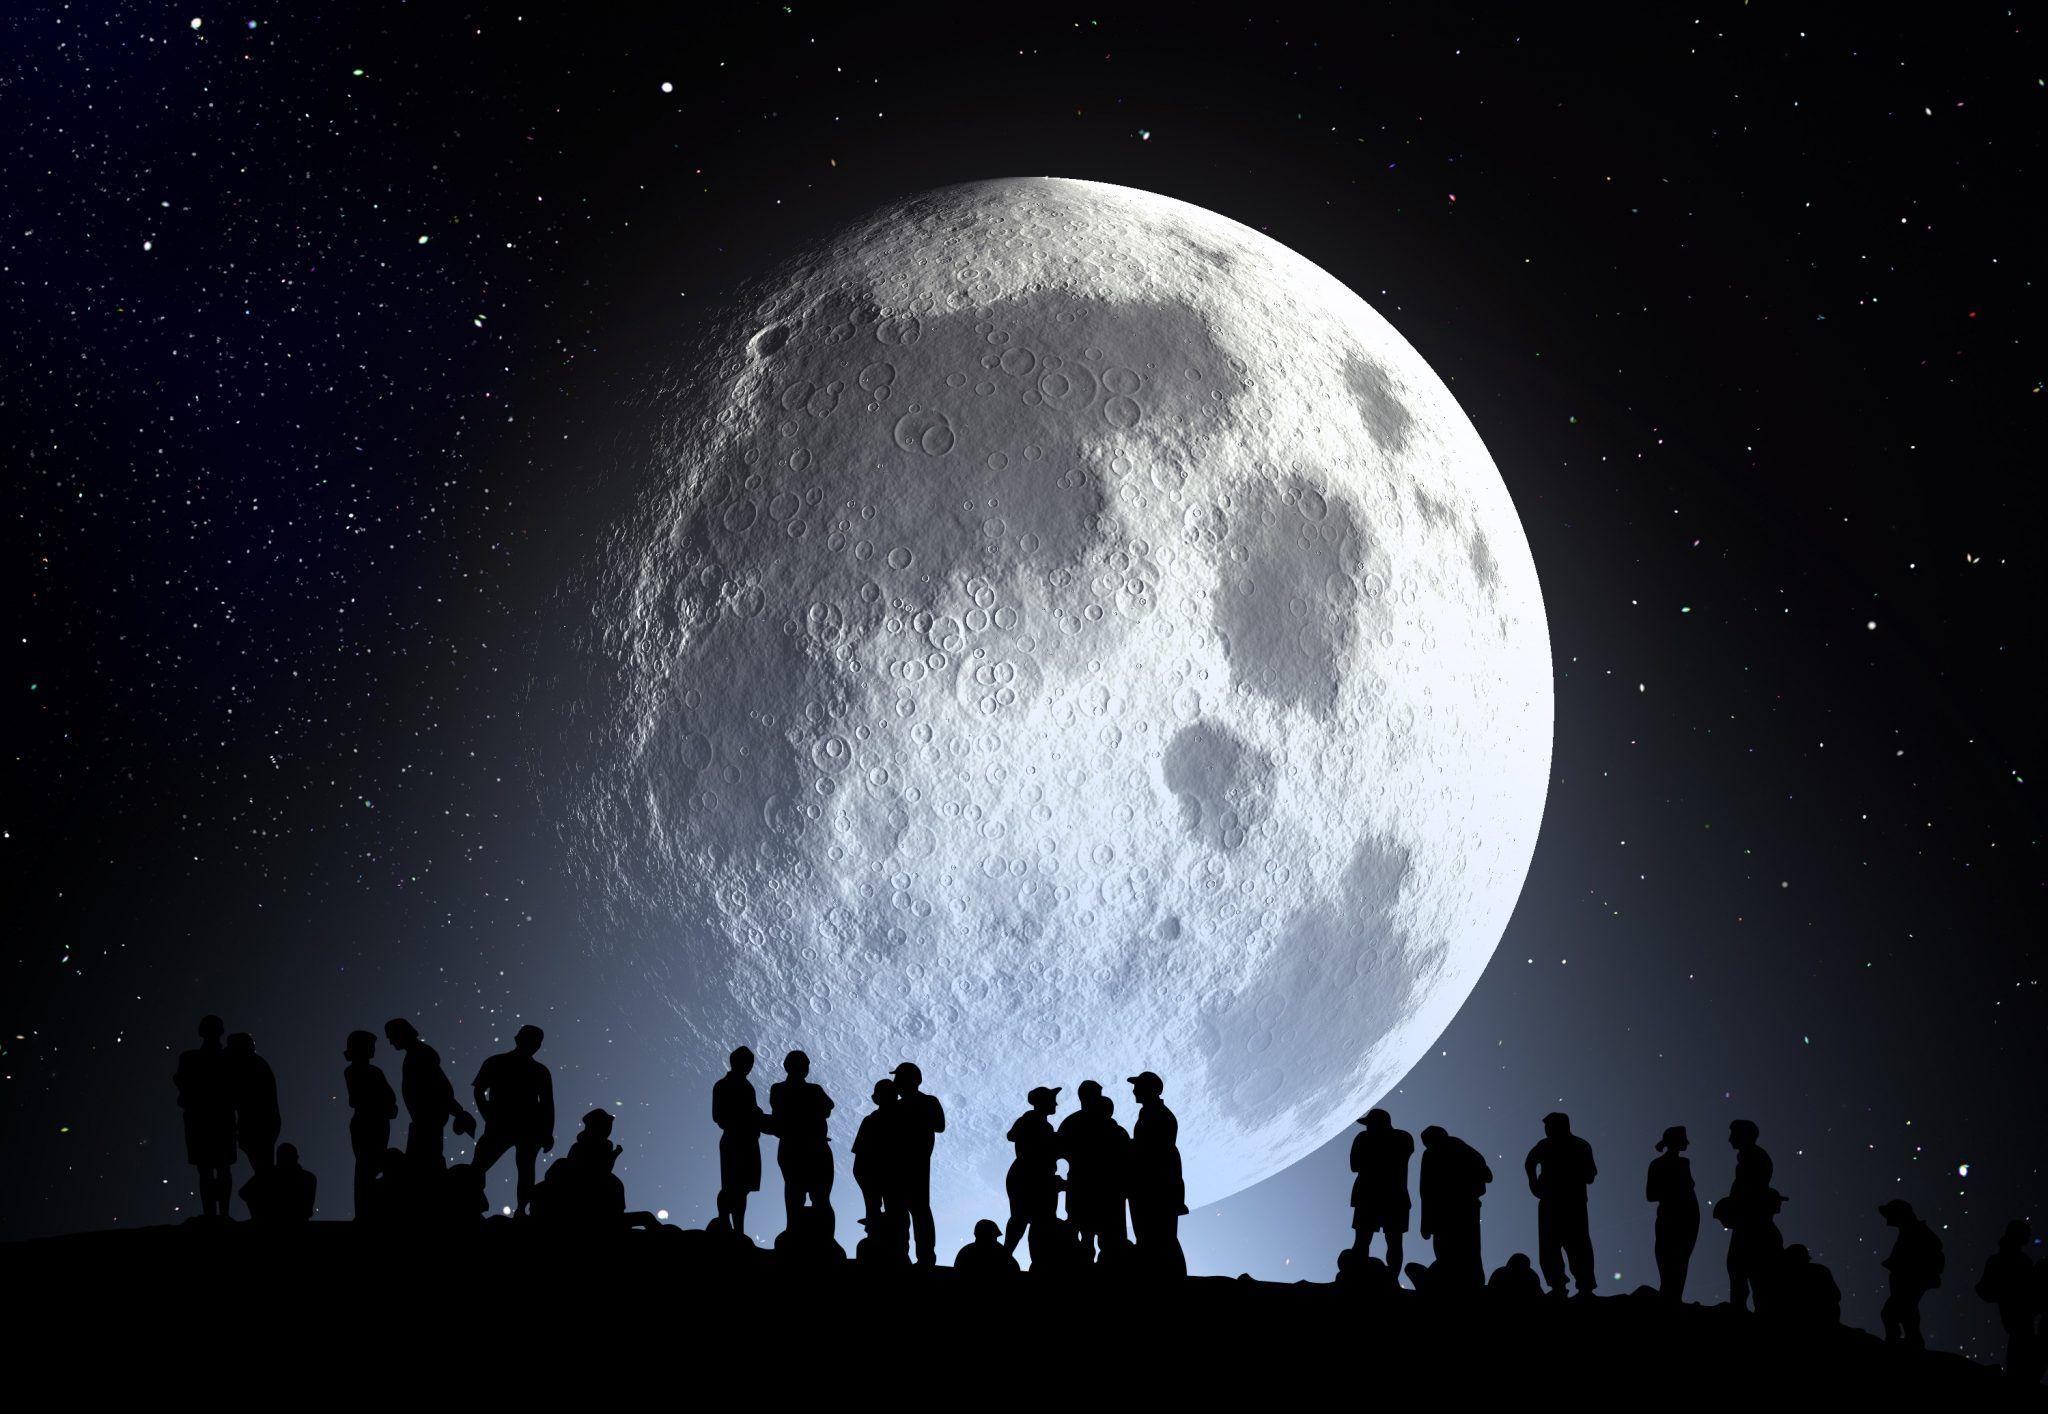 (CANCELADO POR CLIMATOLOGIA) 21-05-2021.- Observación Astronómica en Colmenarejo: Luna, Cielo Profundo, Paseo Estelar…